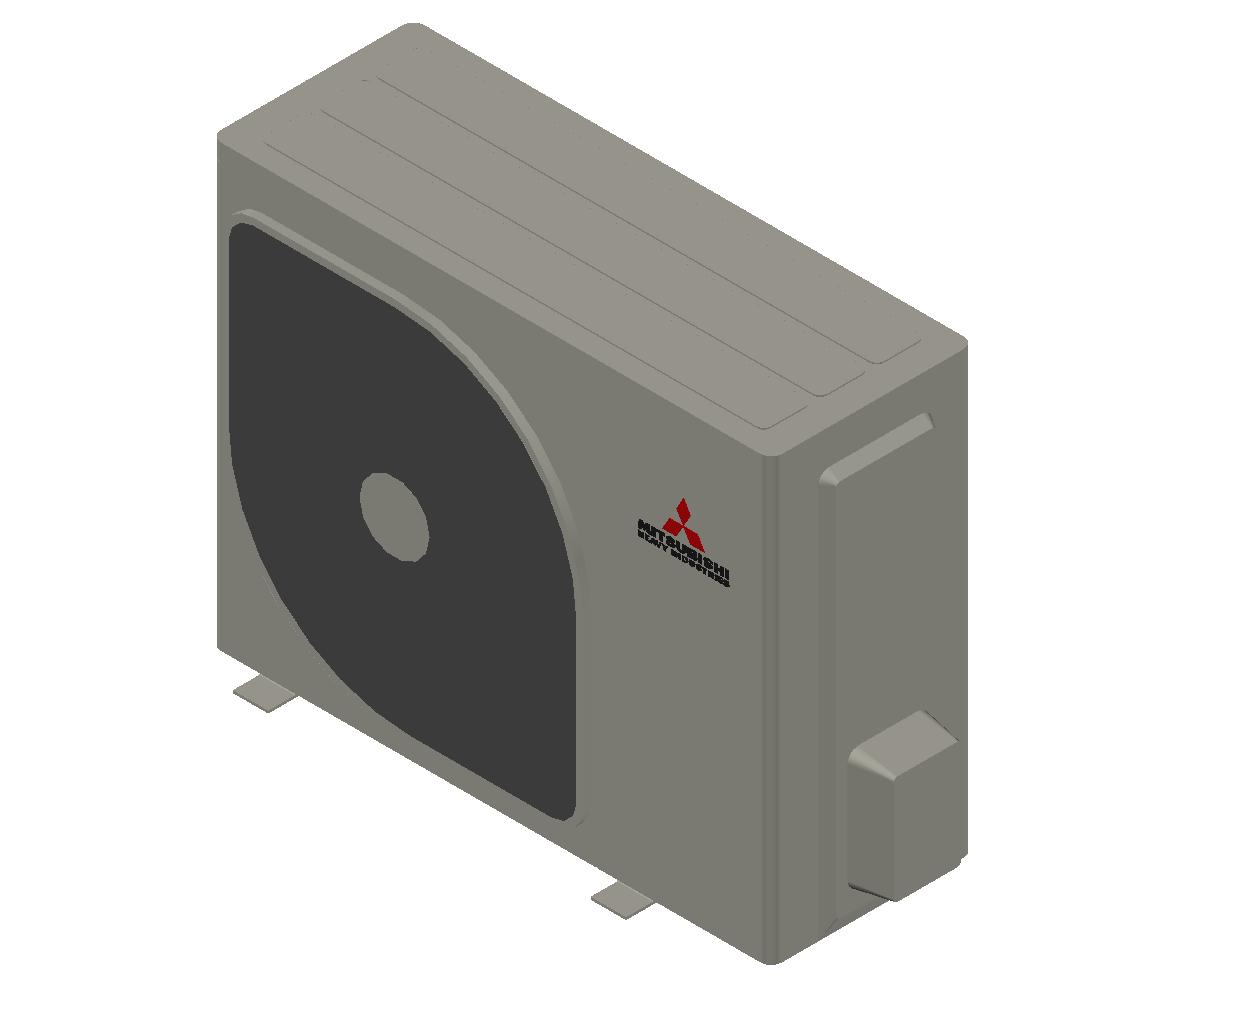 HC_Heat Pump_MEPcontent_Mitsubishi Heavy Industries_PAC-RAC_SRC50ZSX-S_INT-EN.dwg